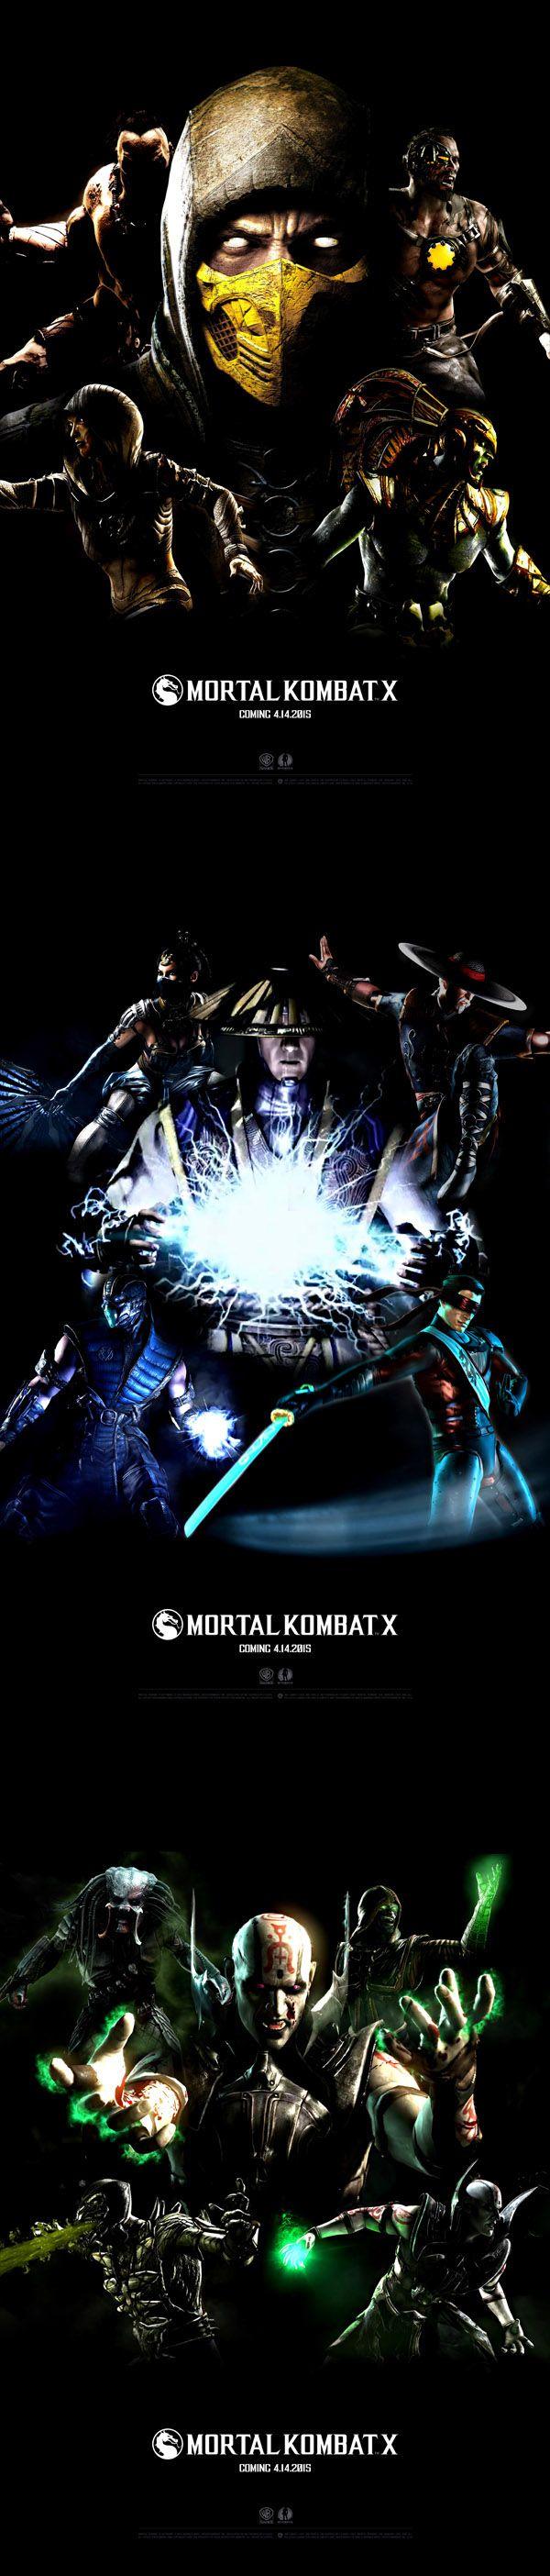 Mortal Kombat X (MKX) - Posters // FanART on Behance